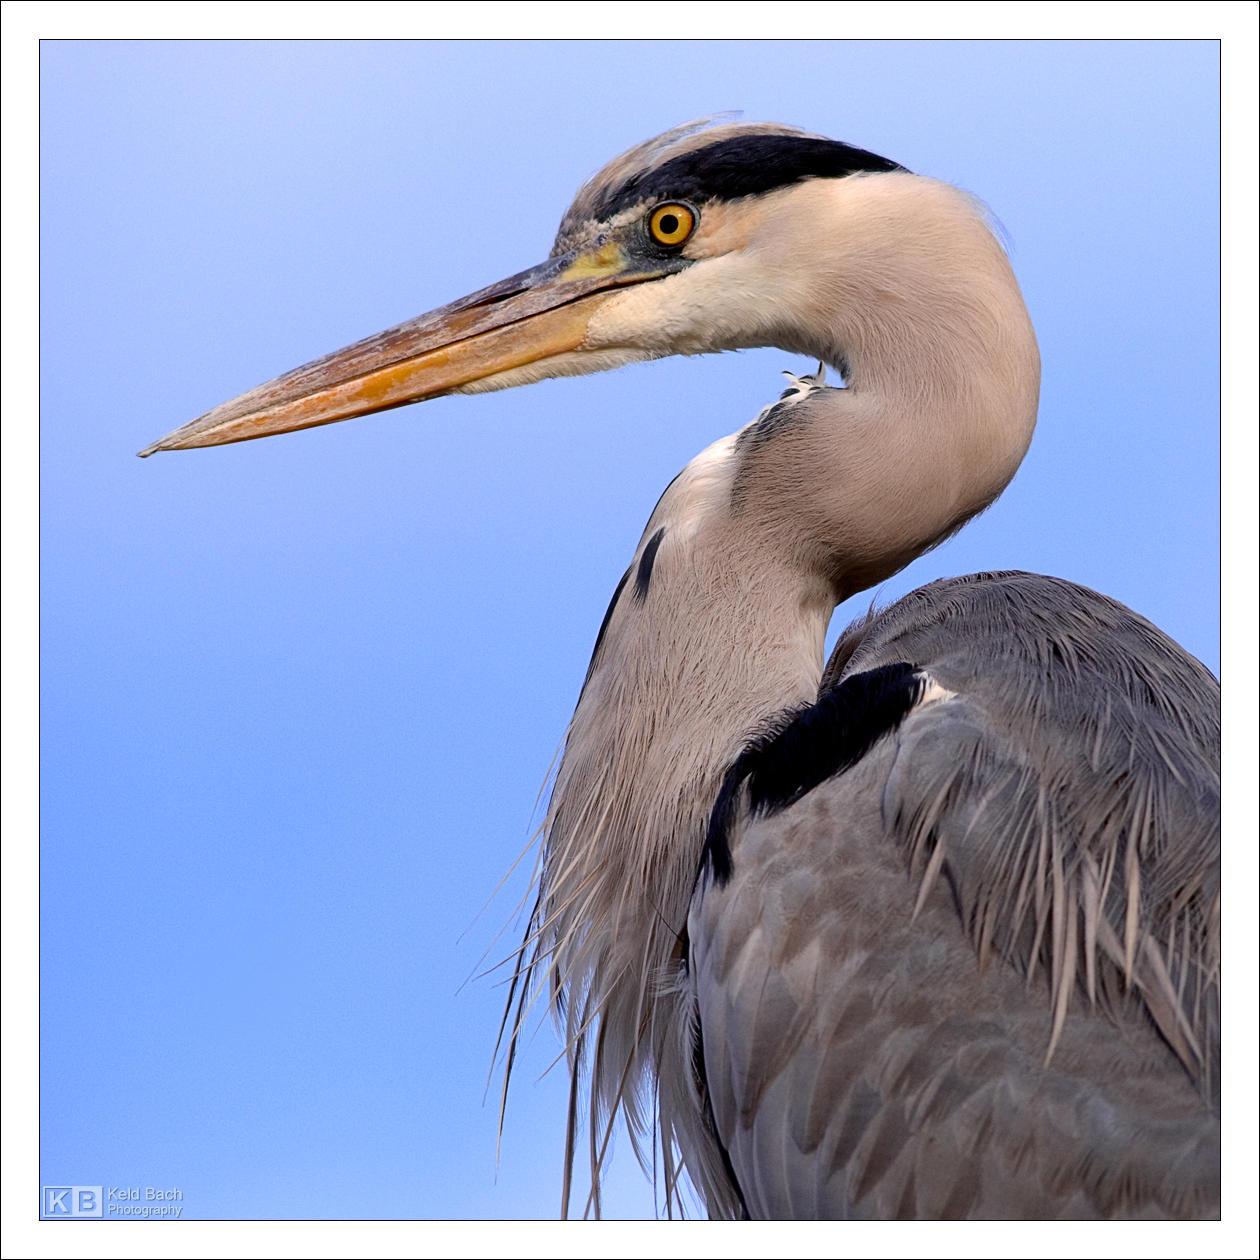 Heron Portrait by KeldBach